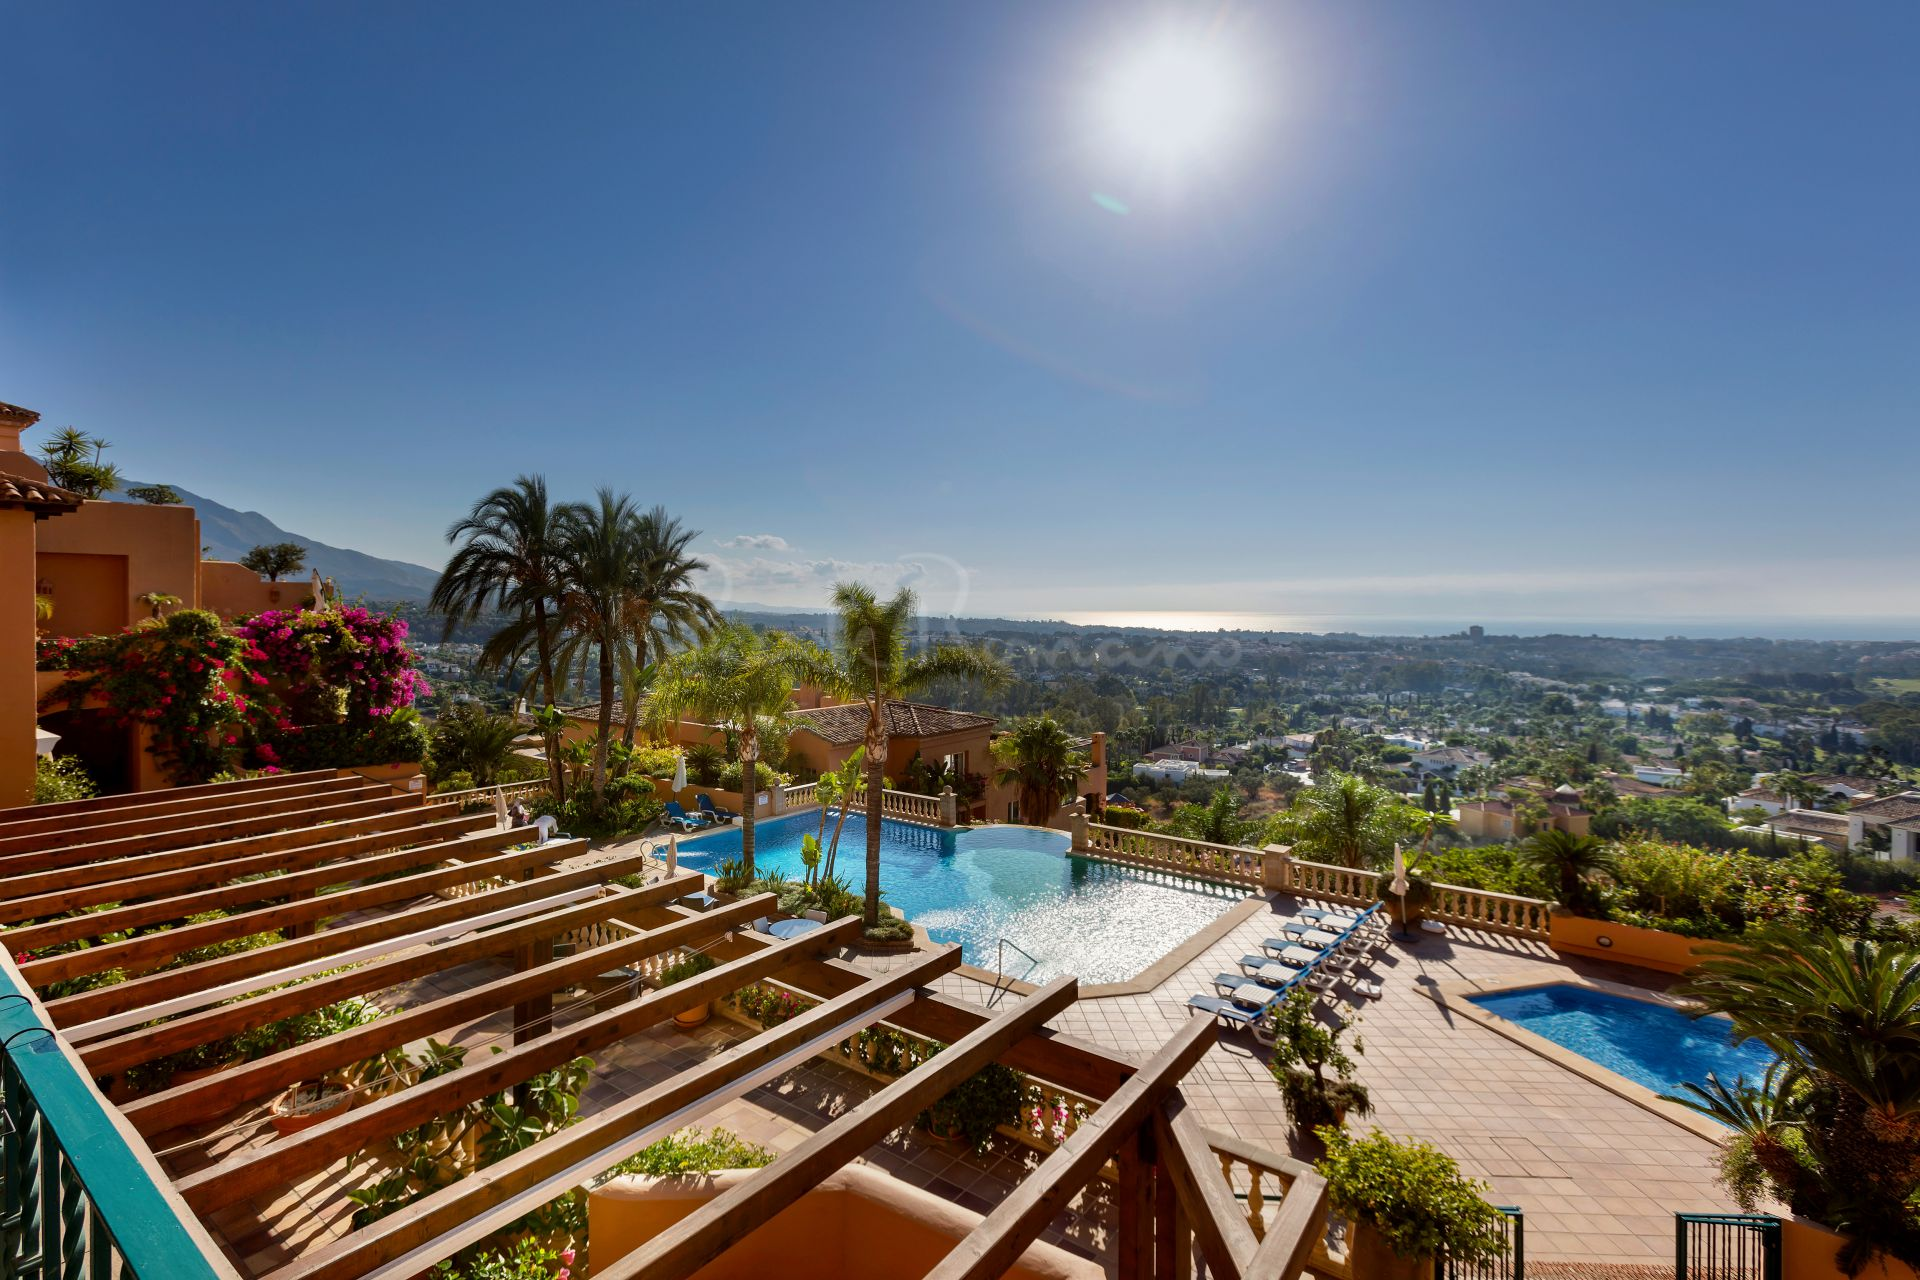 Duplex Penthouse in Los Belvederes, Marbella